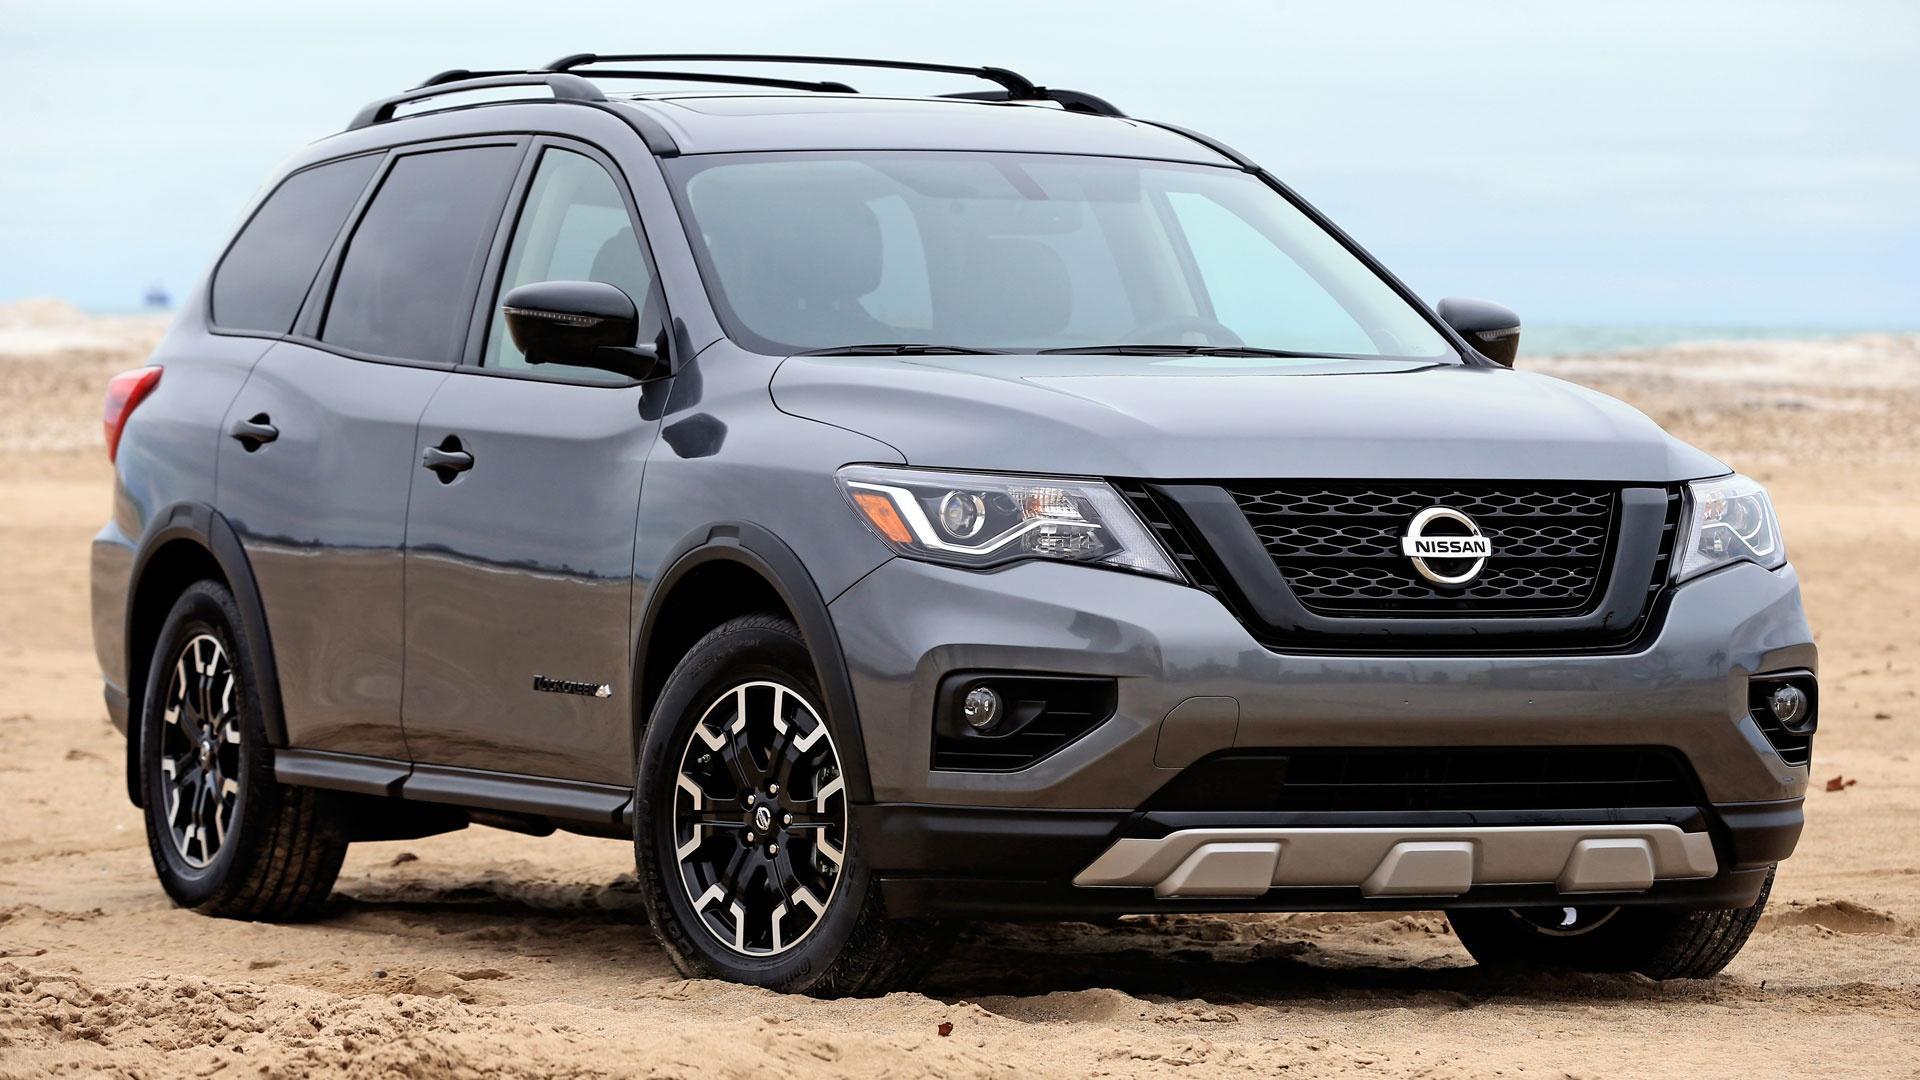 2019 Nissan Pathfinder Rock Creek Edition & 2019 NAIAS